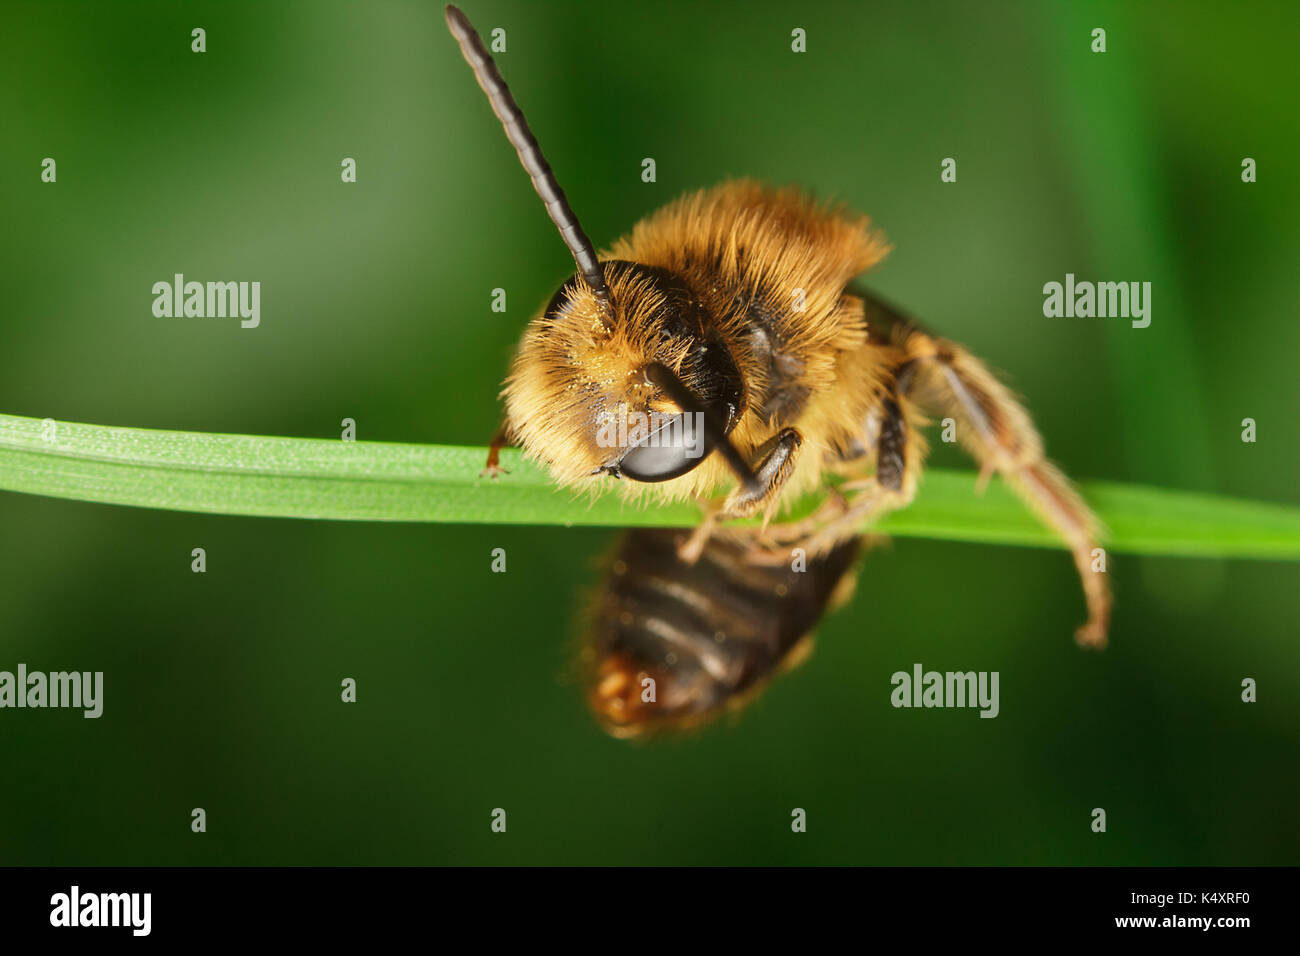 Mining Bee - Stock Image